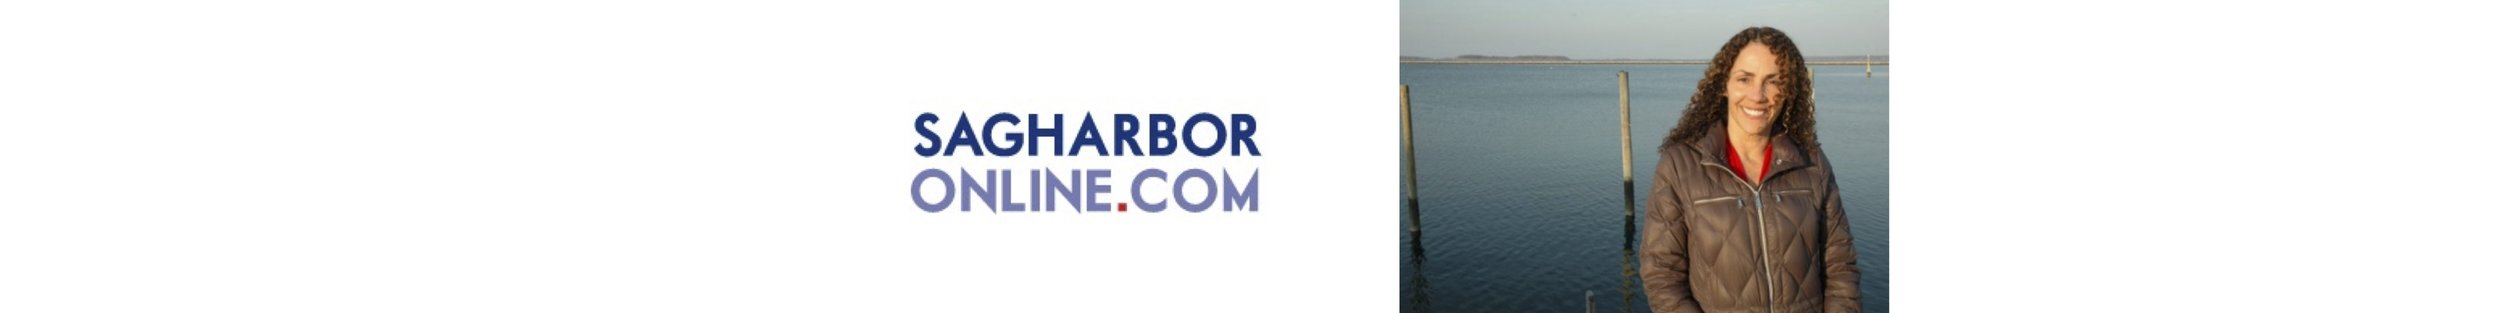 SAG HARBOR EXPRESS 01.2018.jpg